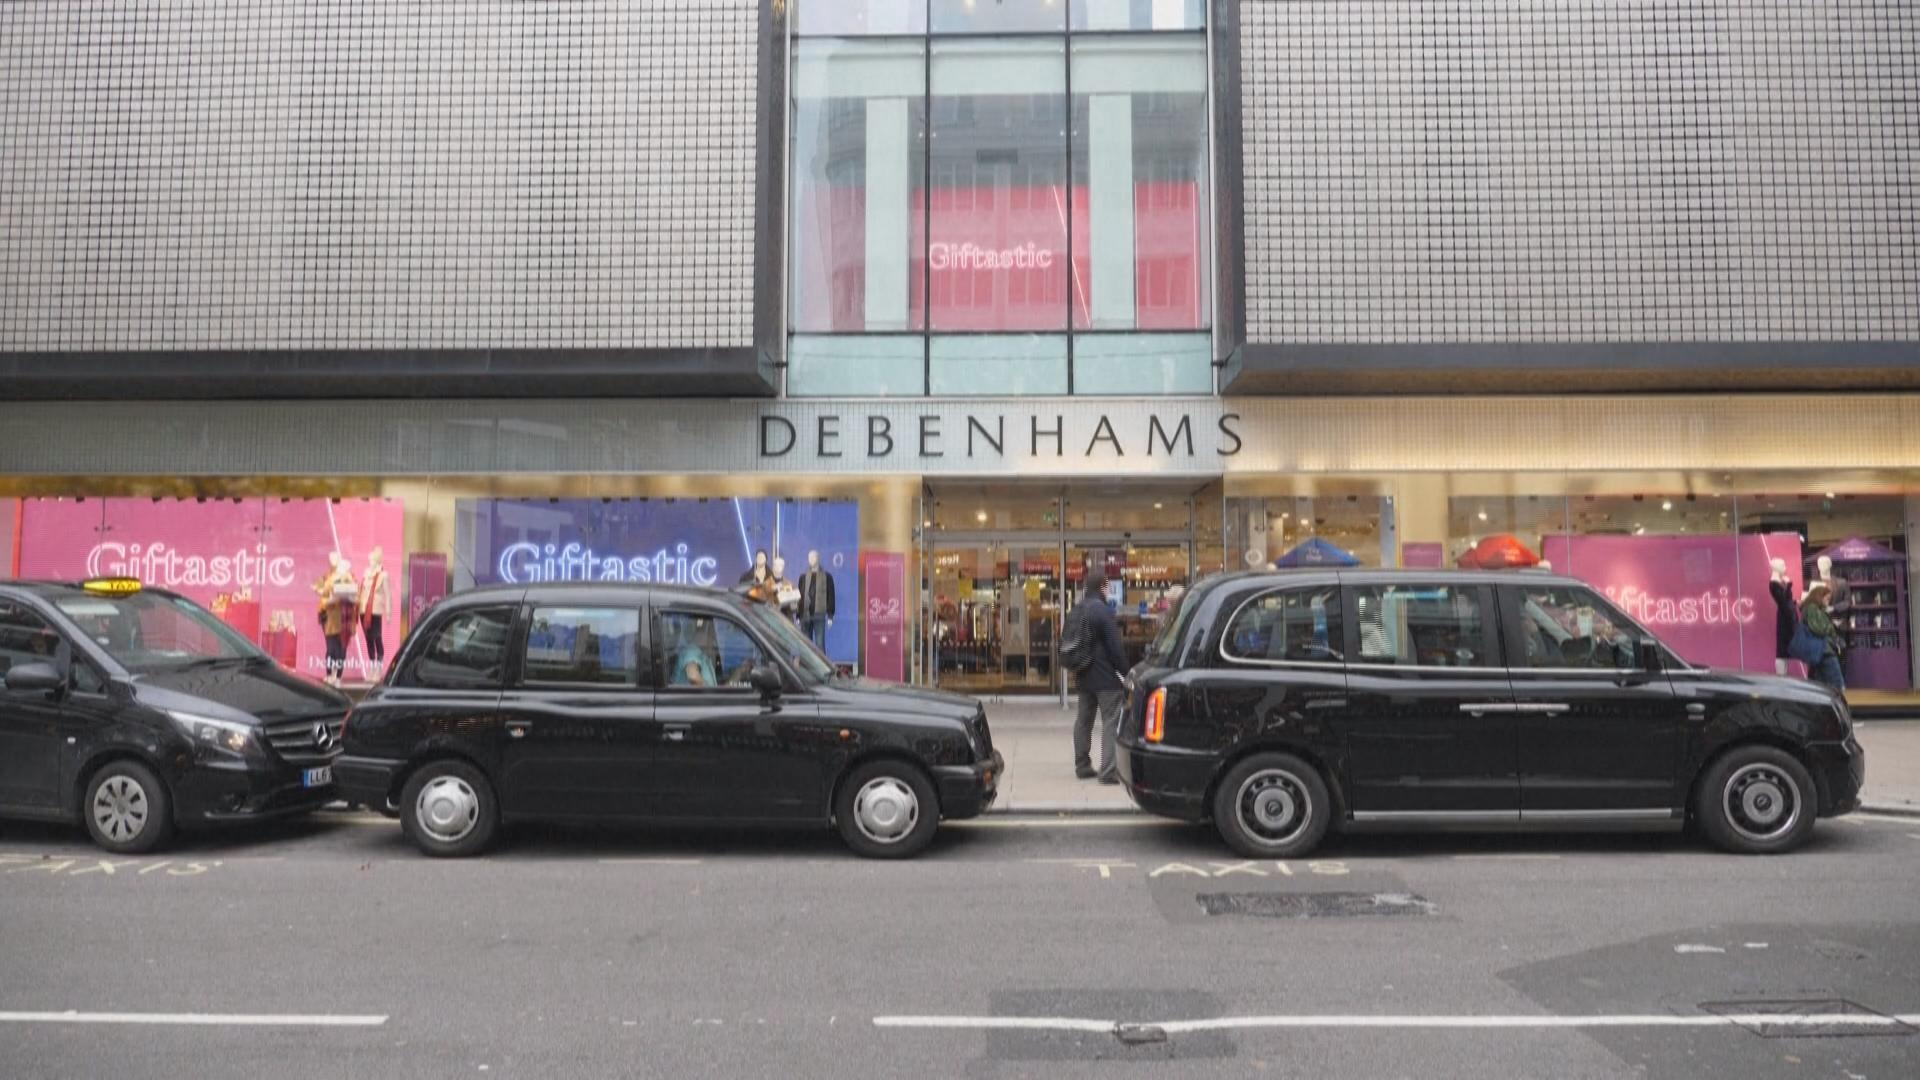 Debenhams, London